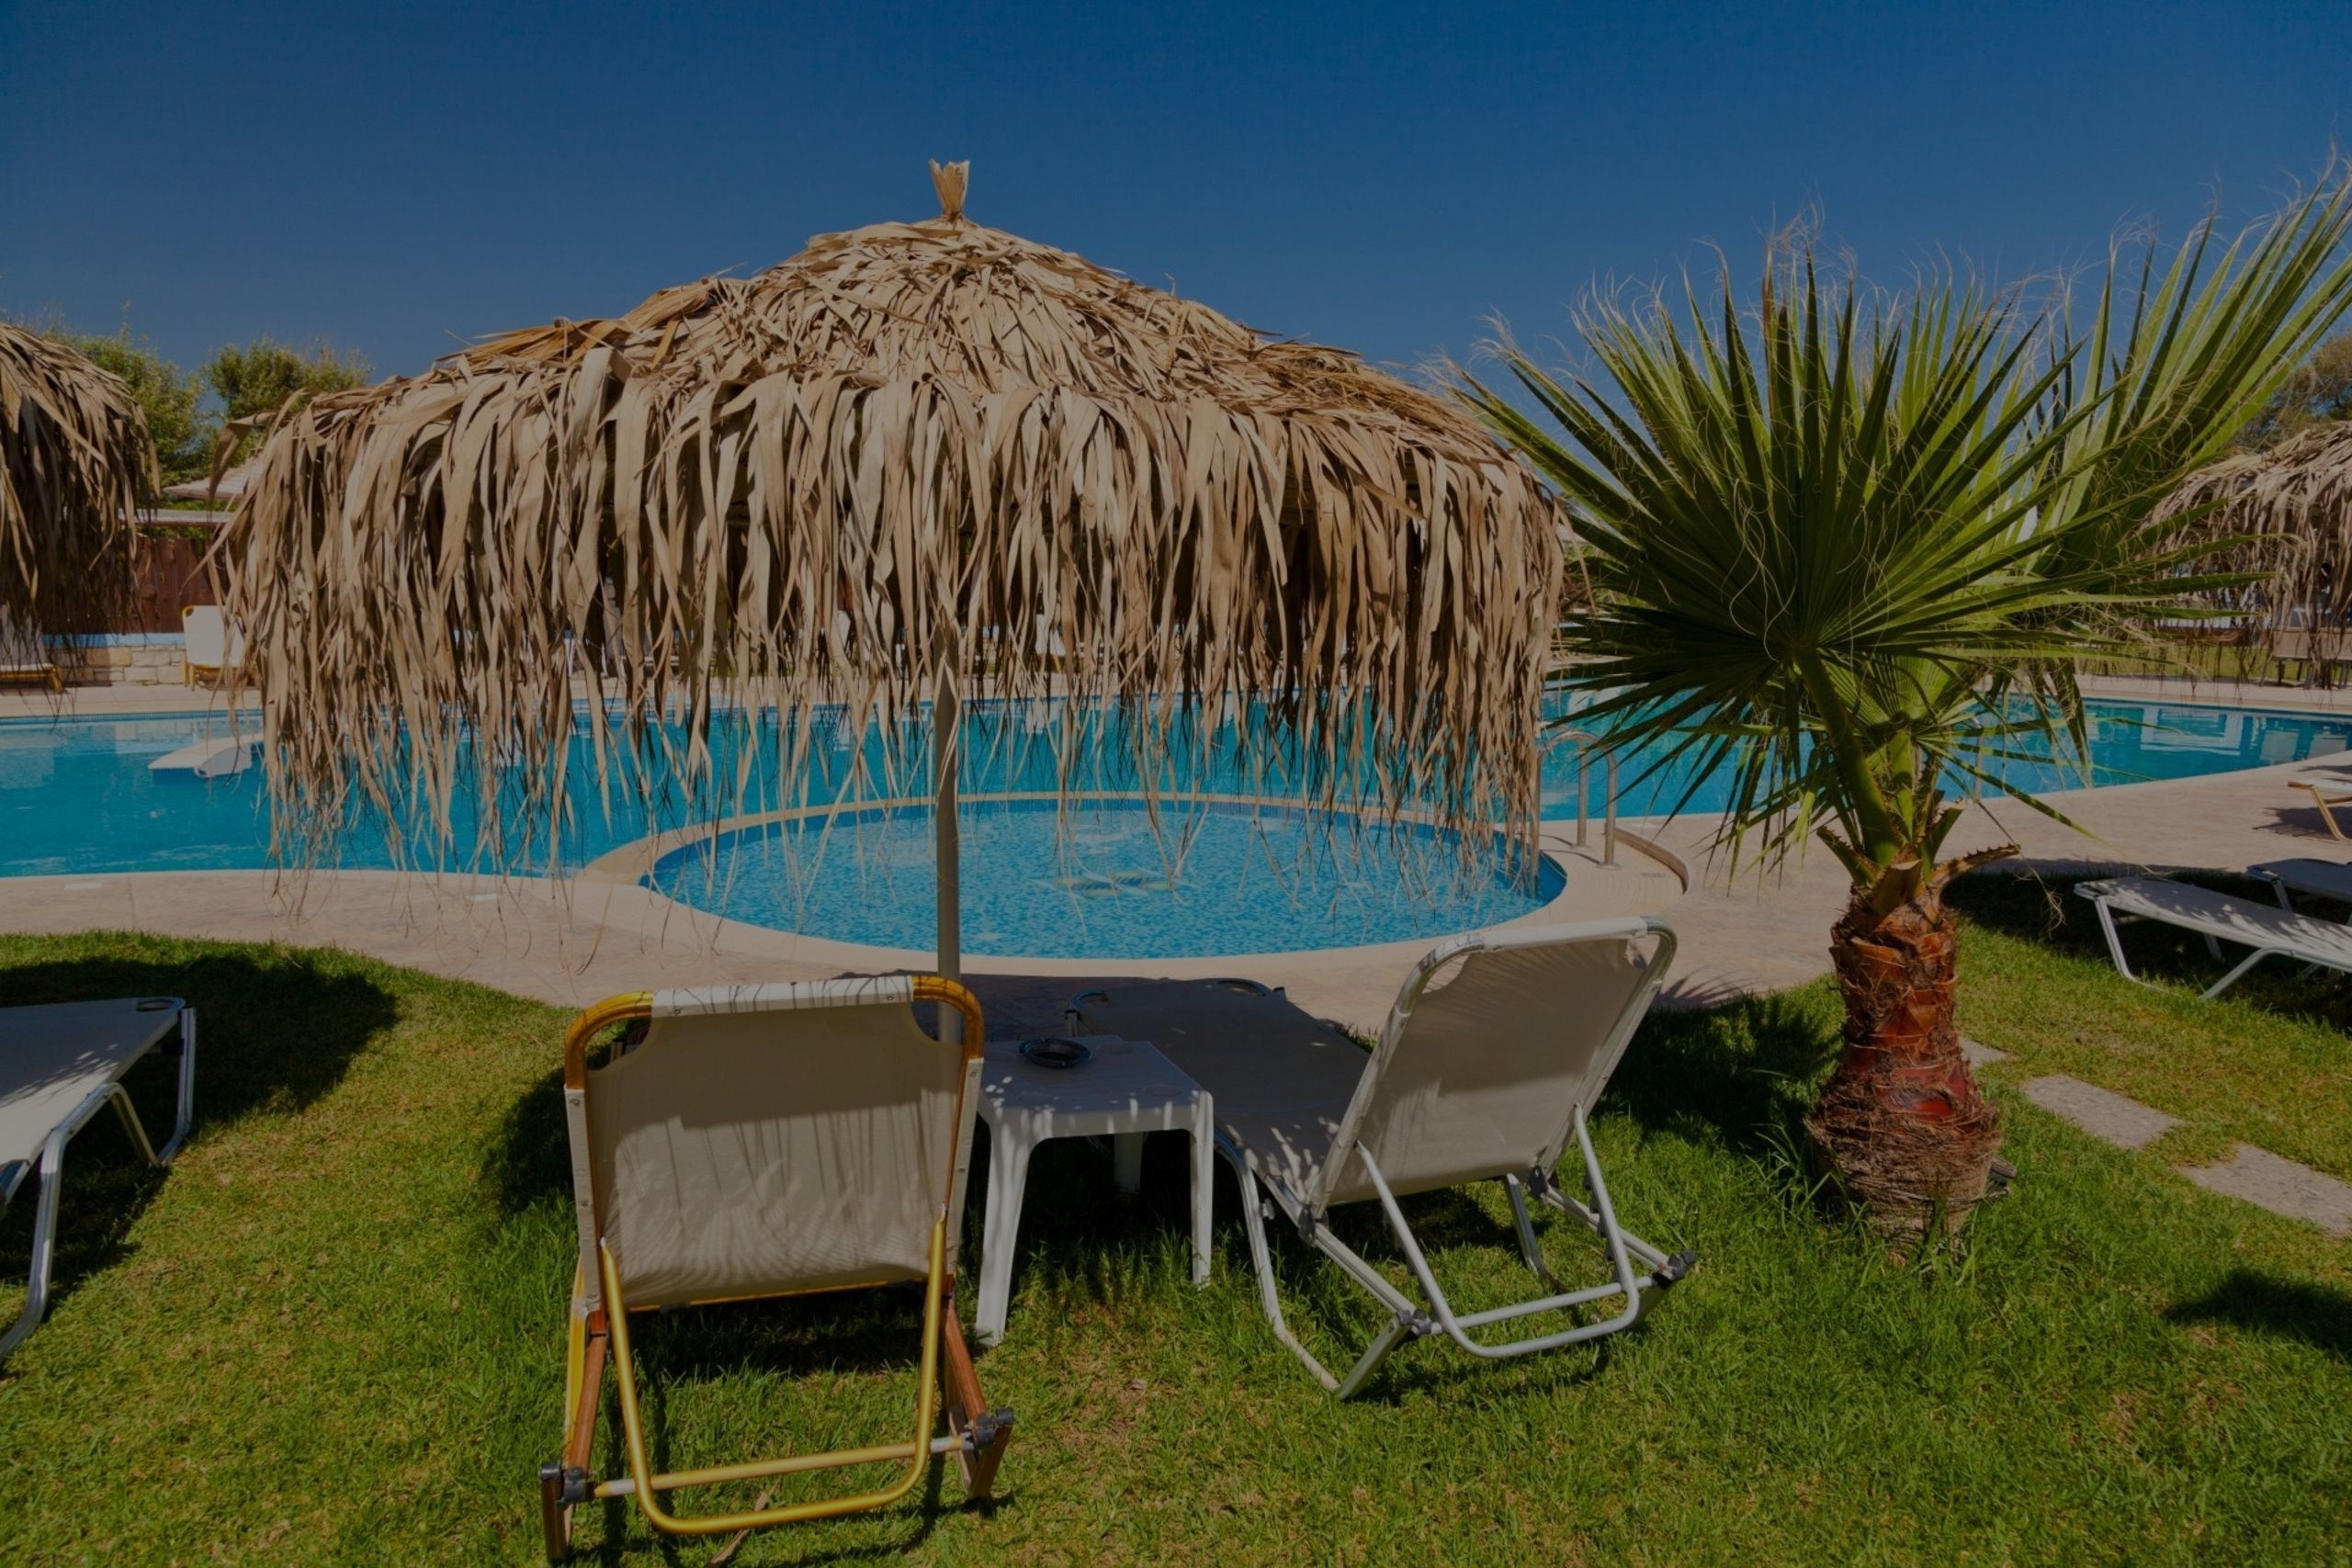 Atlantica Resort Myrtle Beach, SC